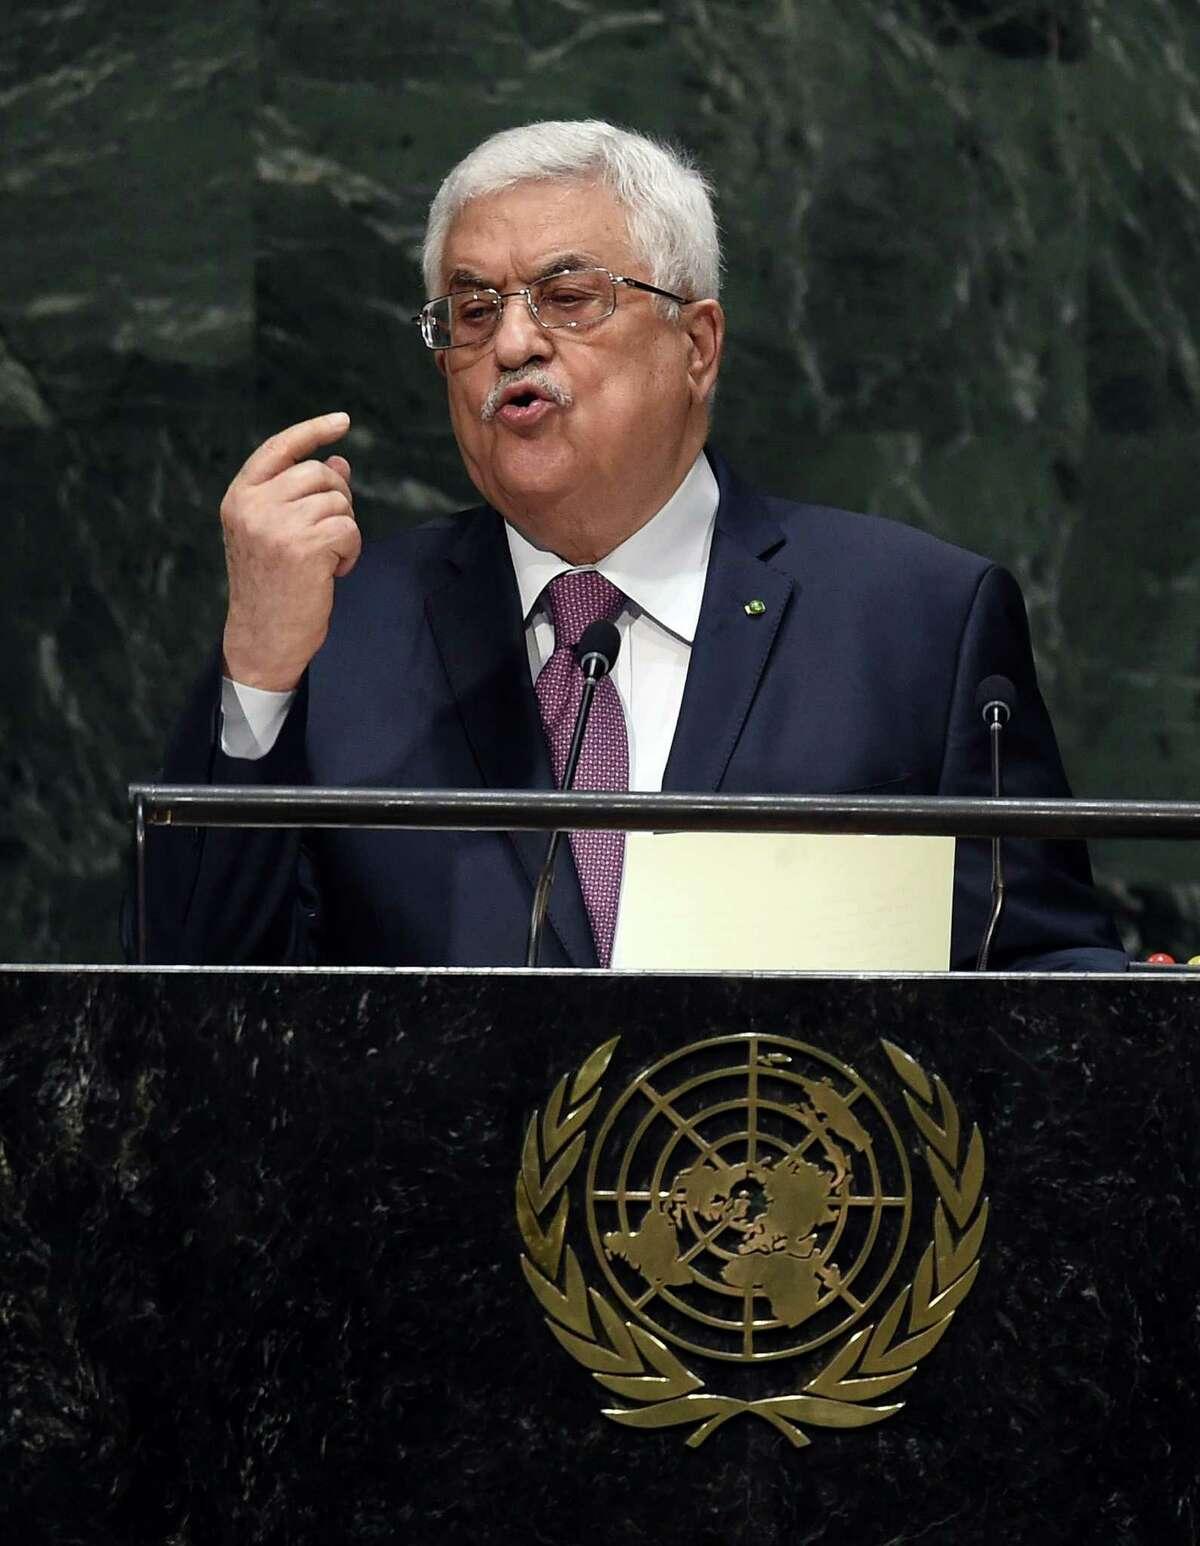 Palestinian President Mahmoud Abbas addresses the U.N. General Assembly.